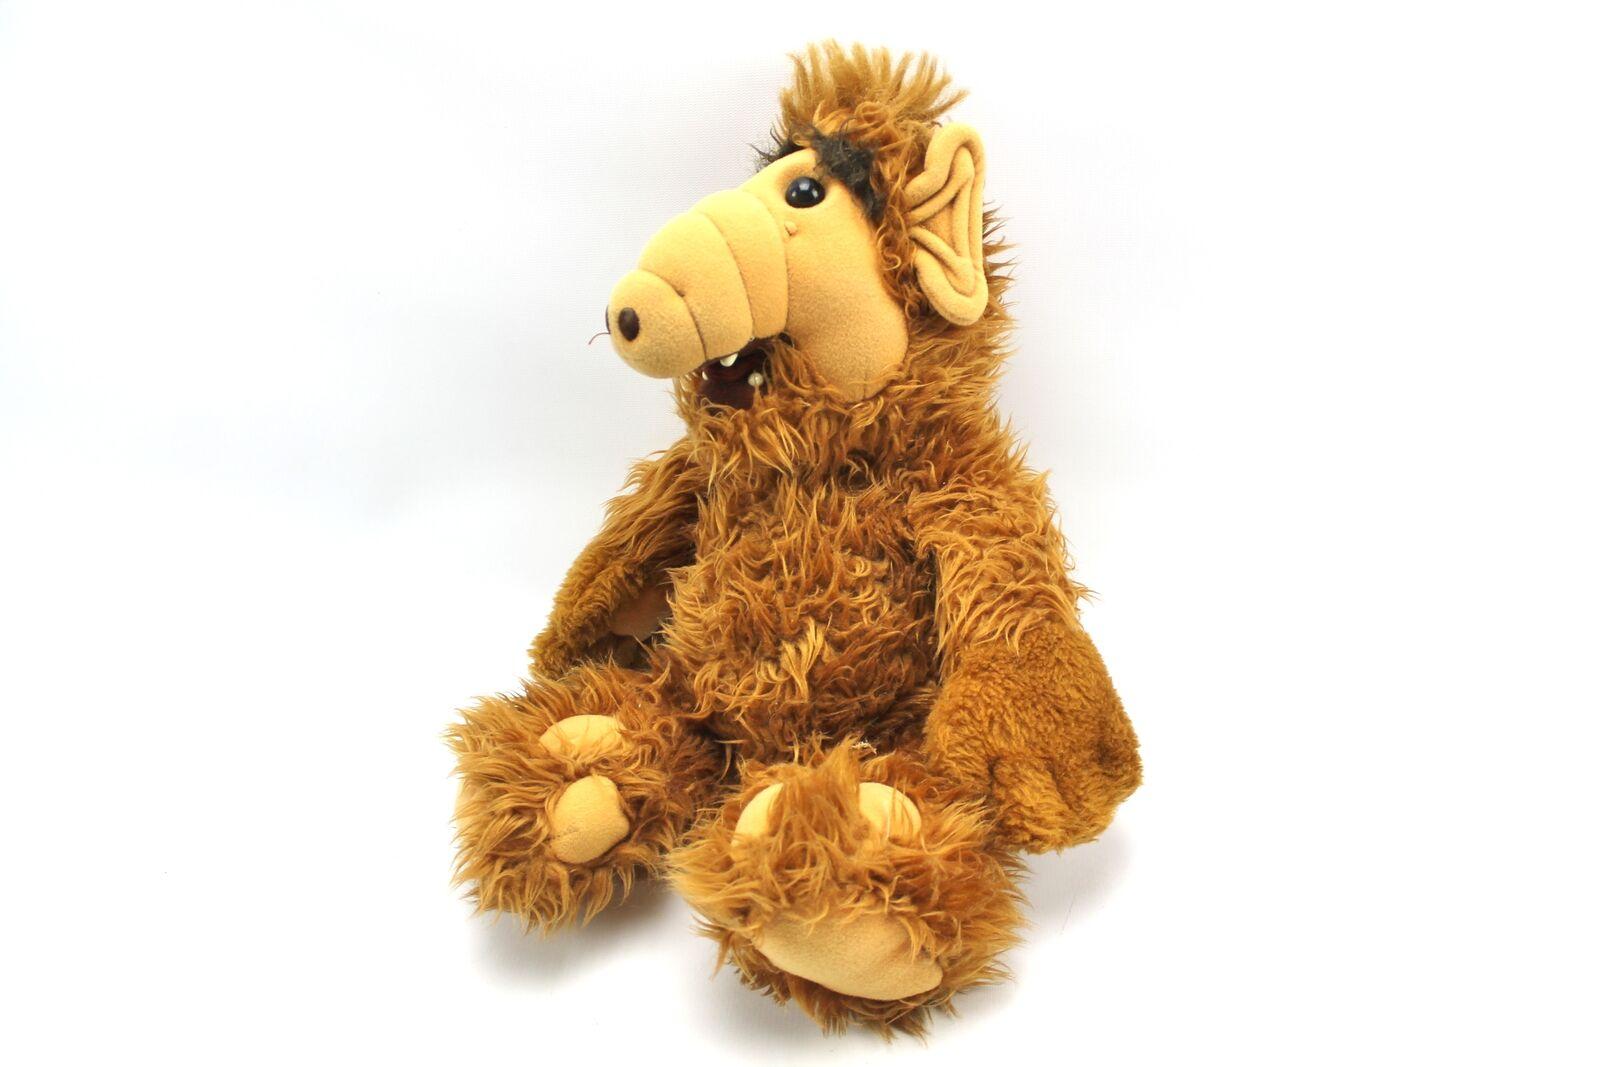 Vintage 19  ALF Plush Toy Stuffed Animal 1986 Alien Productions Coleco